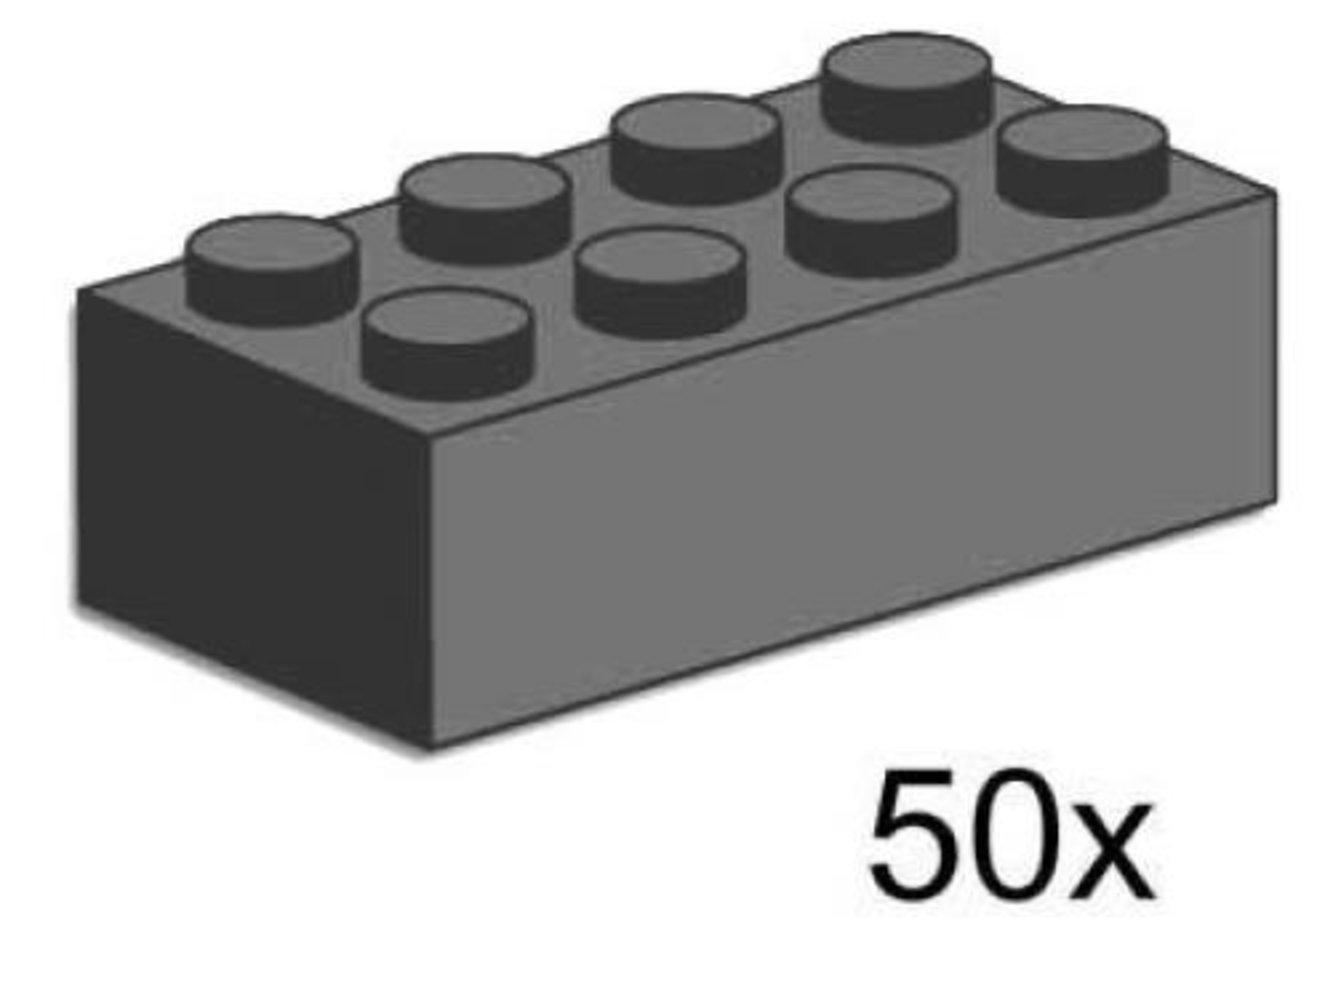 2 x 4 Dark Gray Bricks